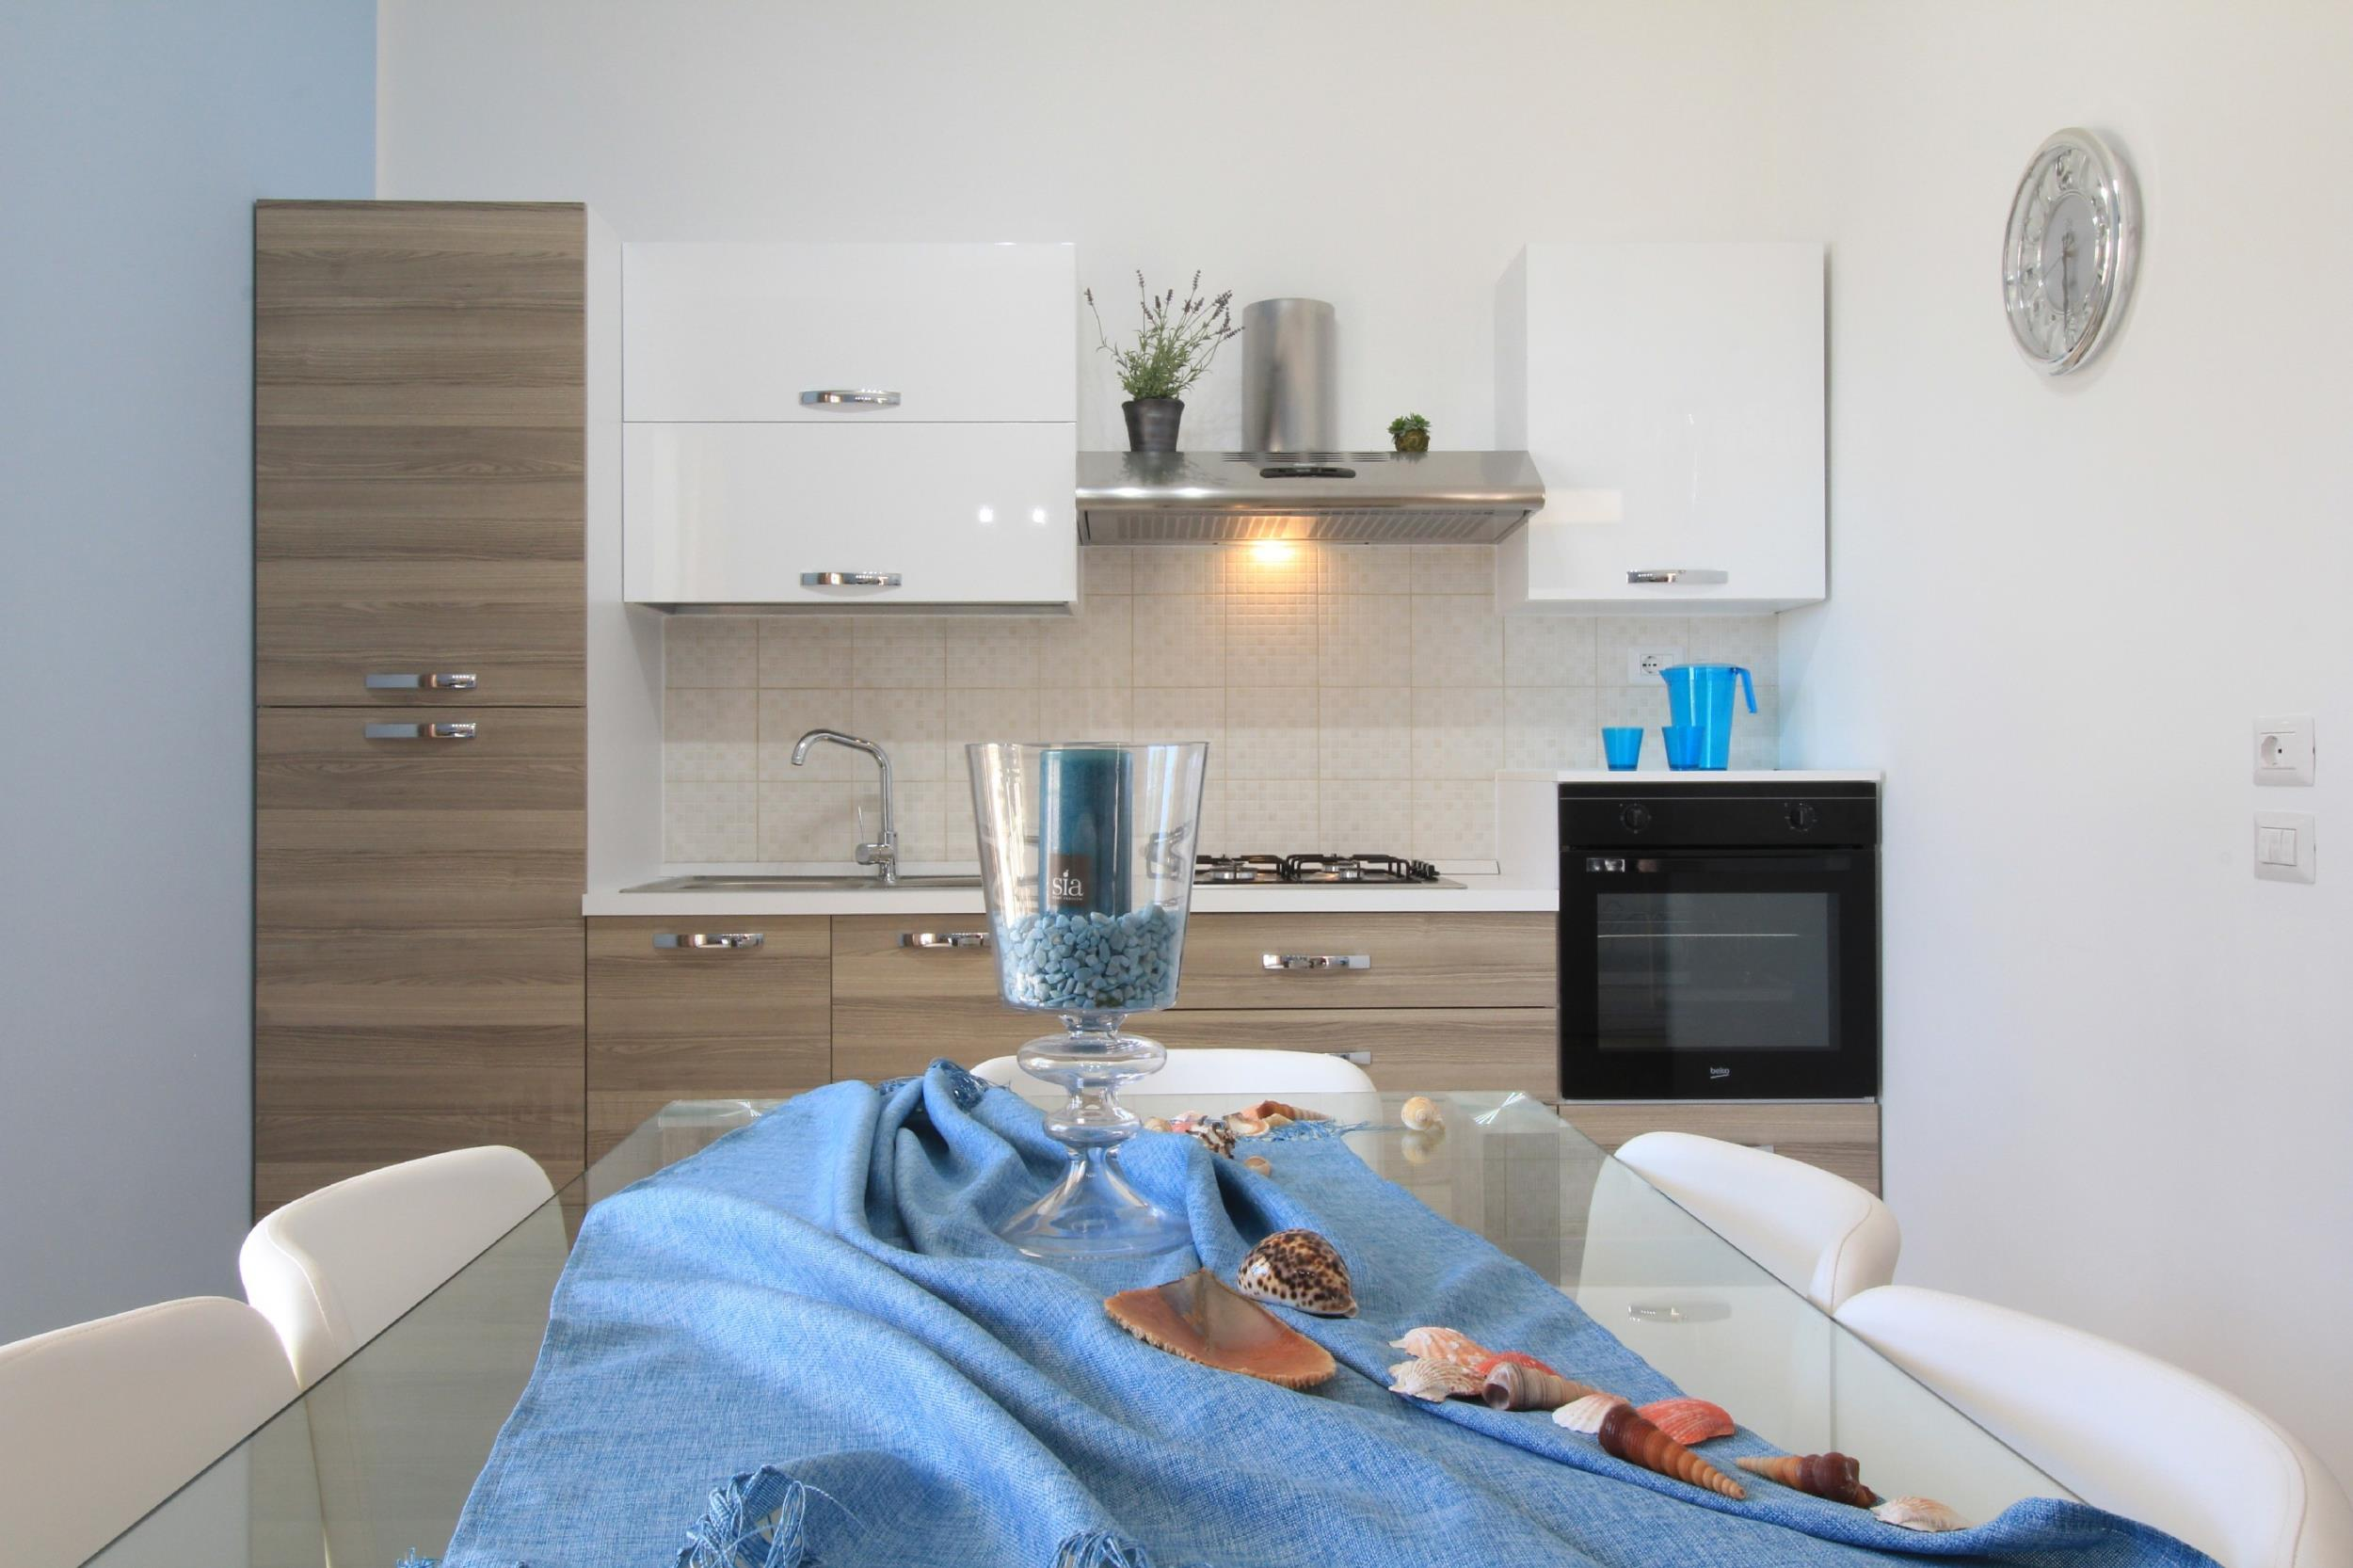 Apartment Elcisia luxe beach house photo 23457096